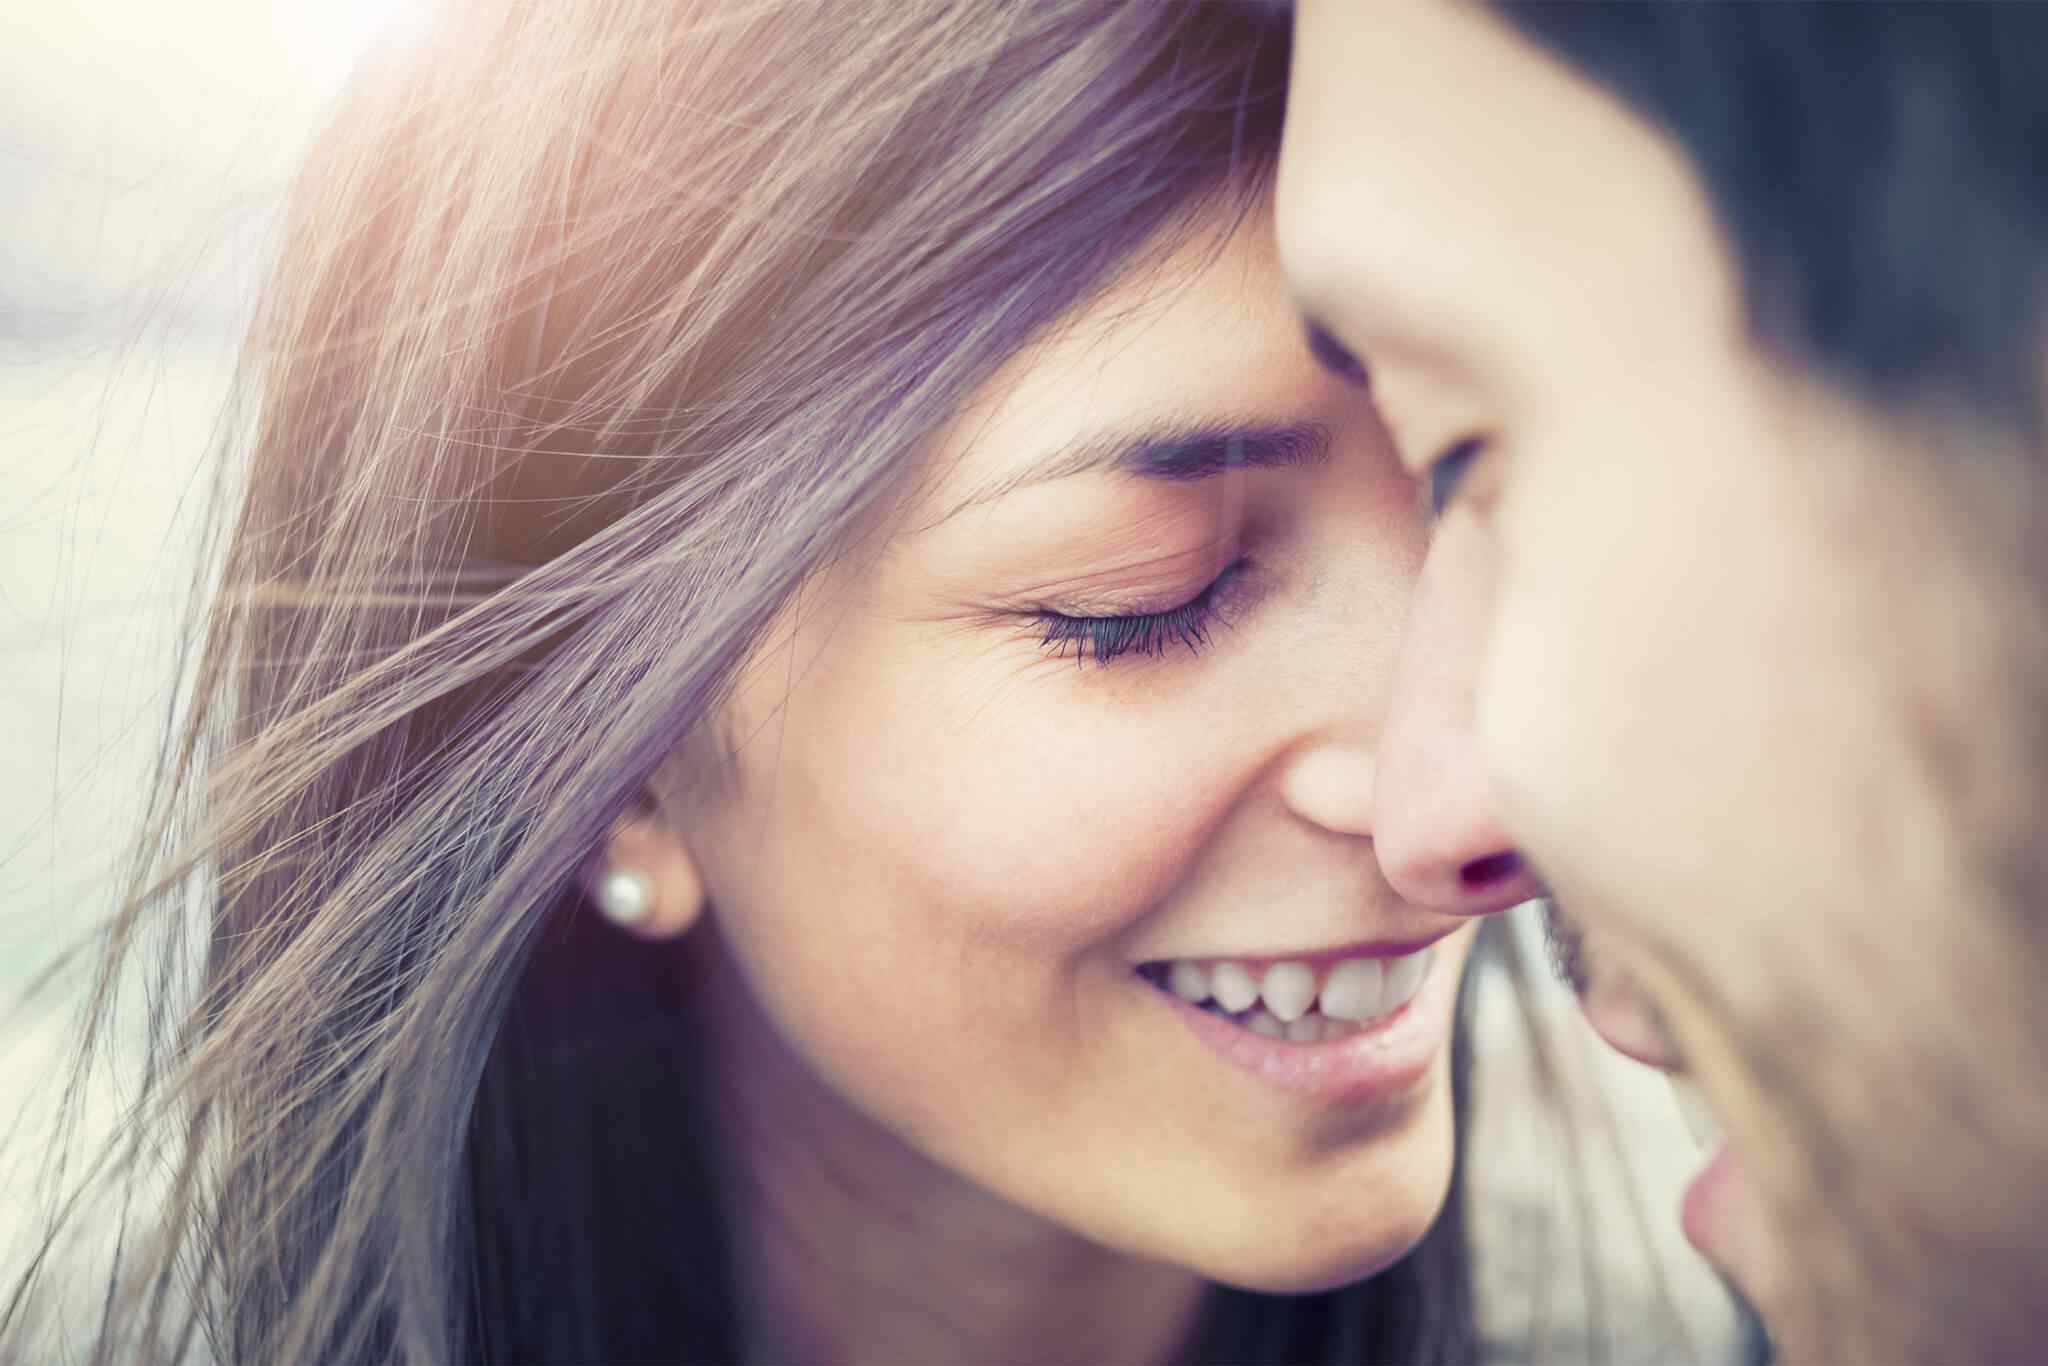 https://i0.wp.com/truhap.com/wp-content/uploads/2018/01/img-class-marriage-01.jpg?fit=2048%2C1366&ssl=1